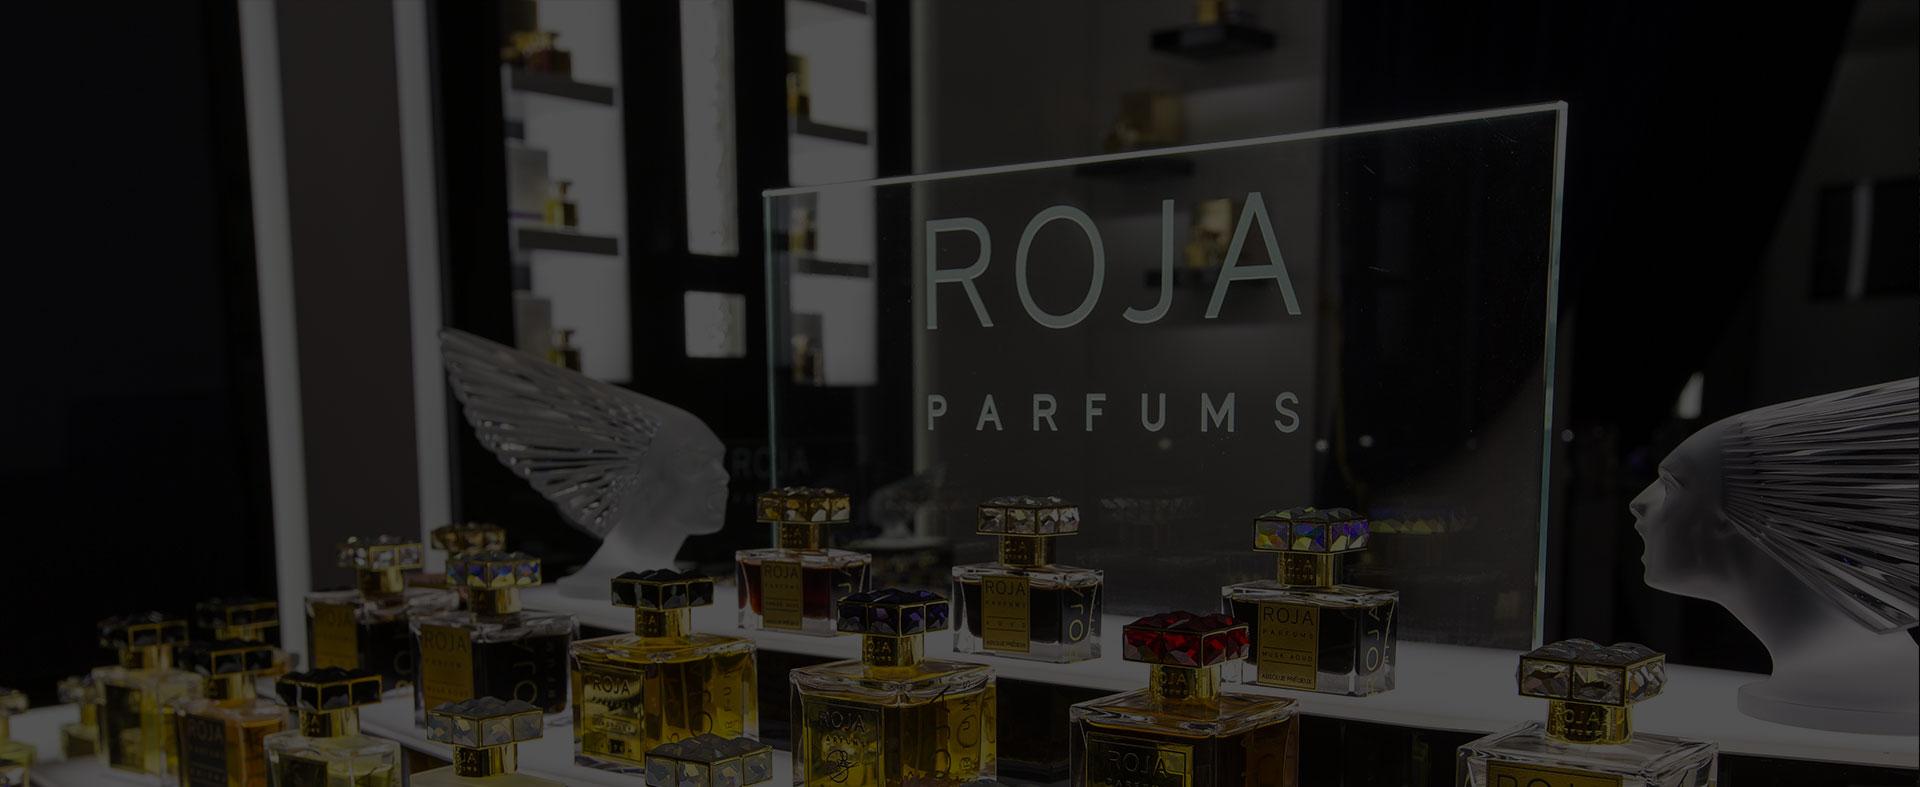 ROJA-iran-perfume-distribution-havin-tejarat